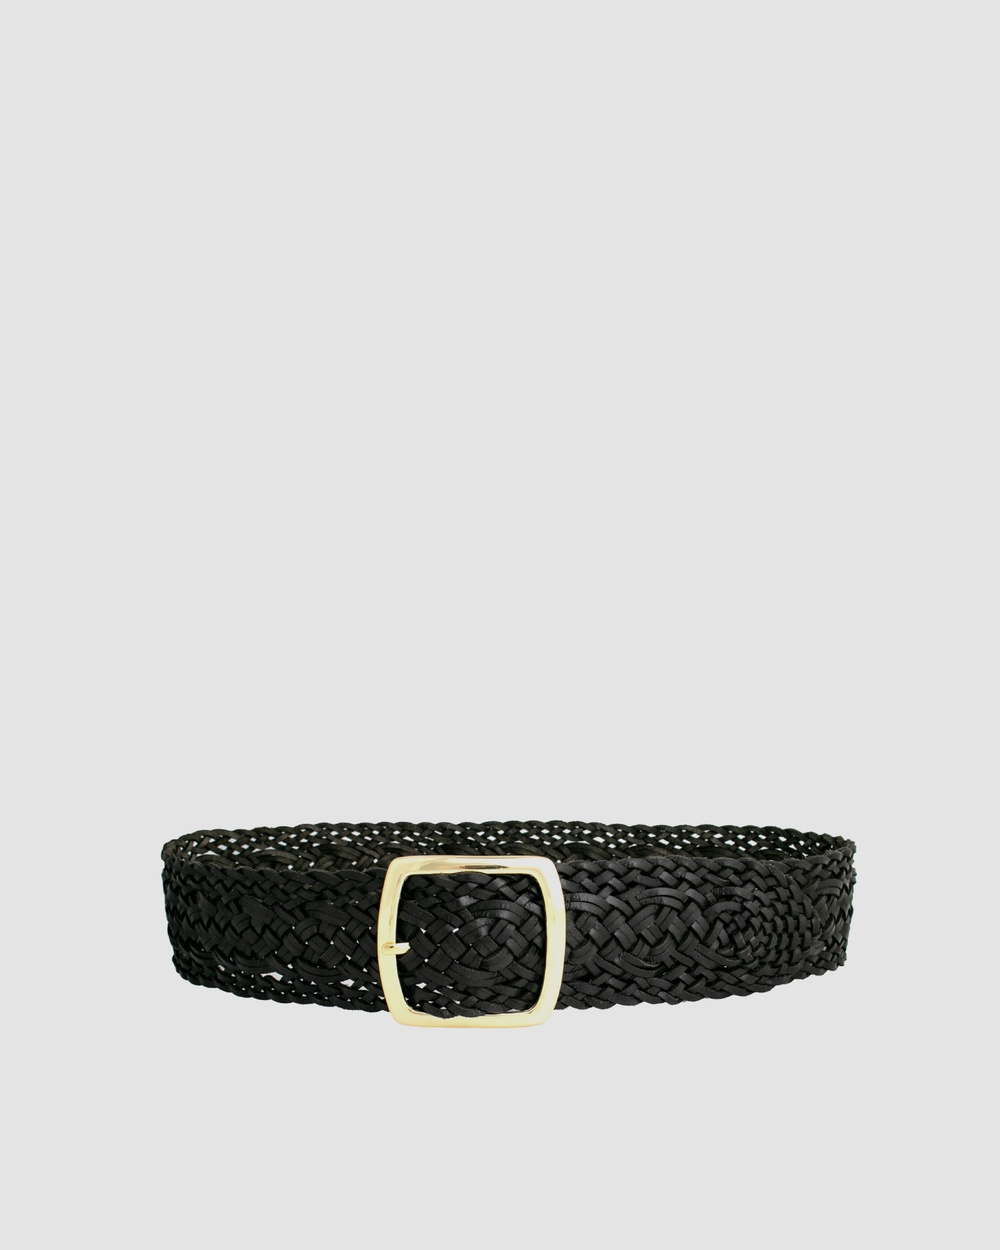 Loop Leather Co Tivoli Belts Black